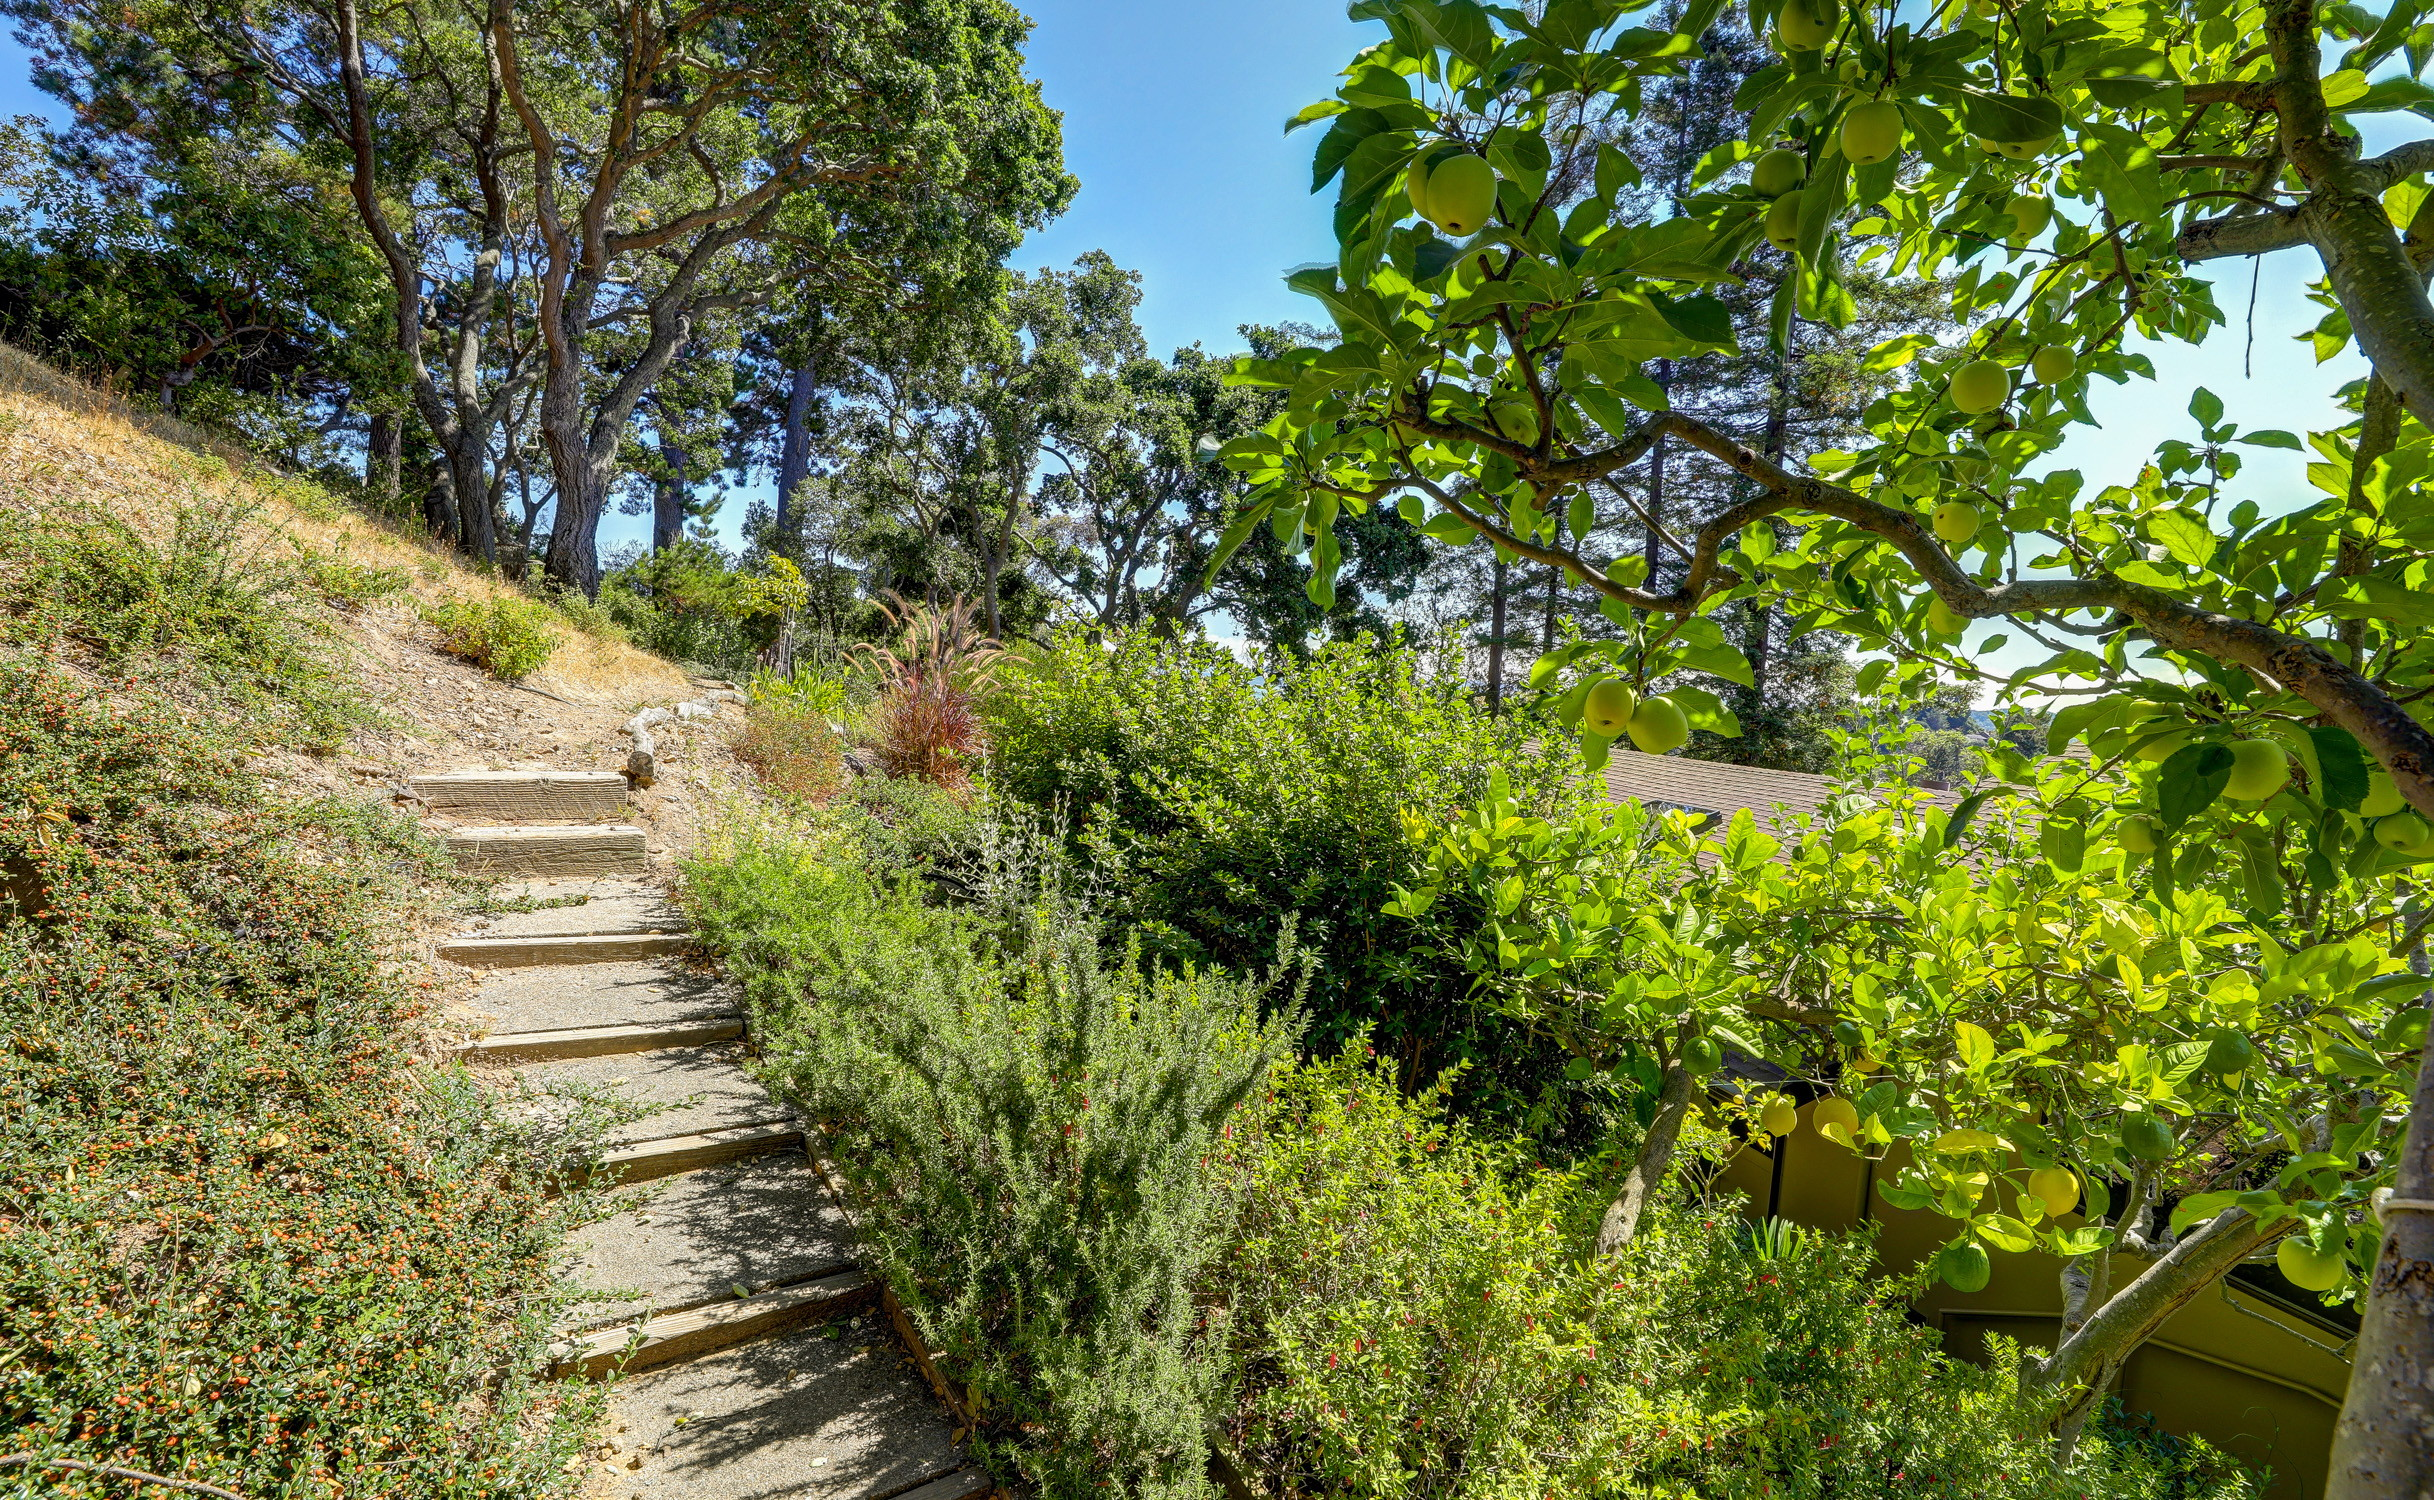 16Dorian 81 MLSSan Rafael Real Estate - Listed by Julia Fitzpatrick + Allie Fornesi Team Own Marin County .jpg